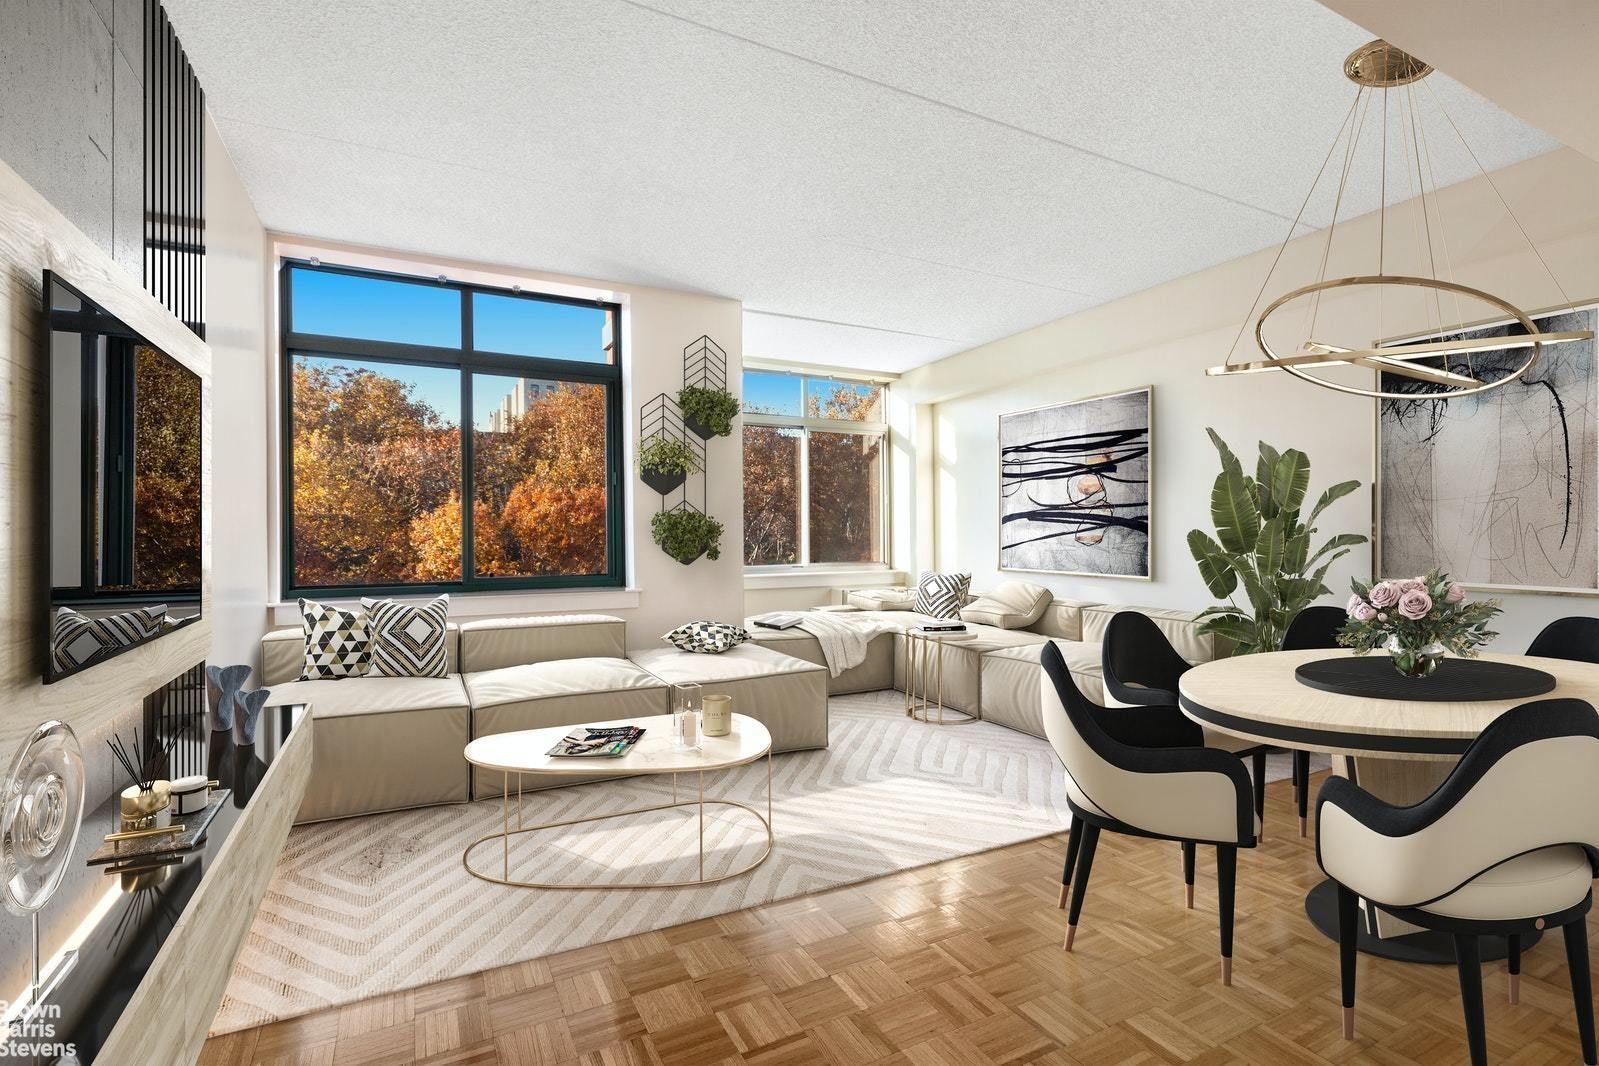 Apartment for sale at 130 Bradhurst Avenue, Apt 801